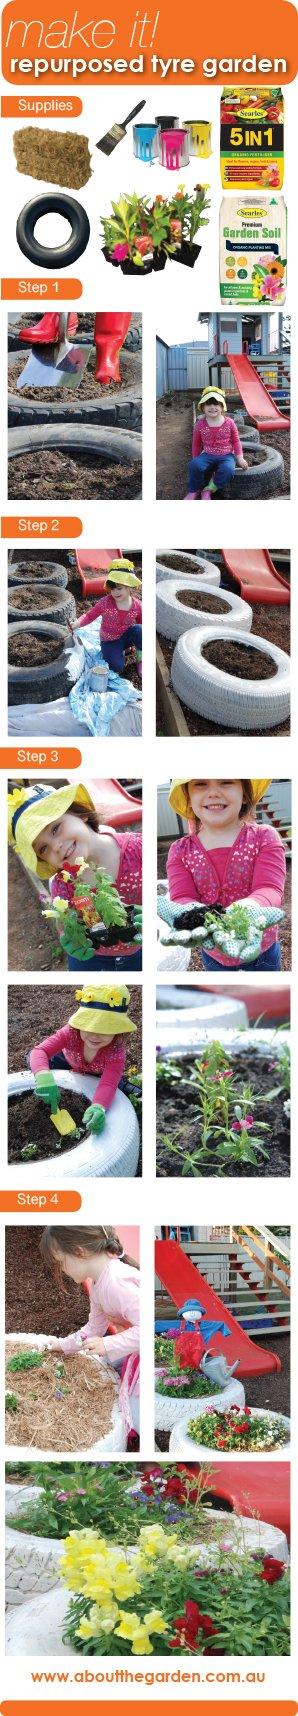 Make it- repurposed tyre garden.indd